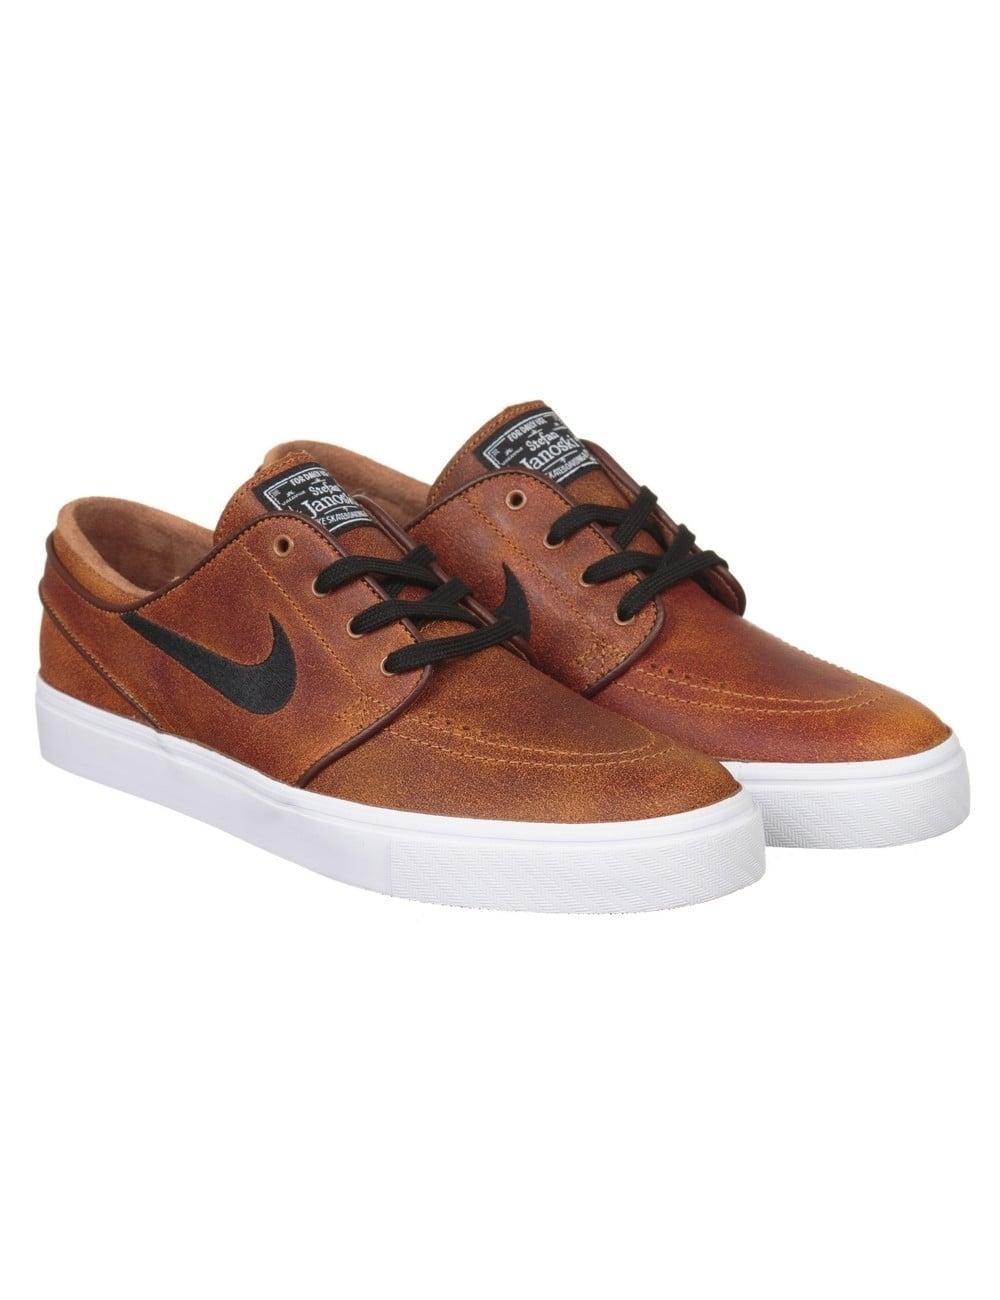 bec8a44fec3 Nike SB Stefan Janoski Elite Shoes - Ale Brown Black - Footwear from ...